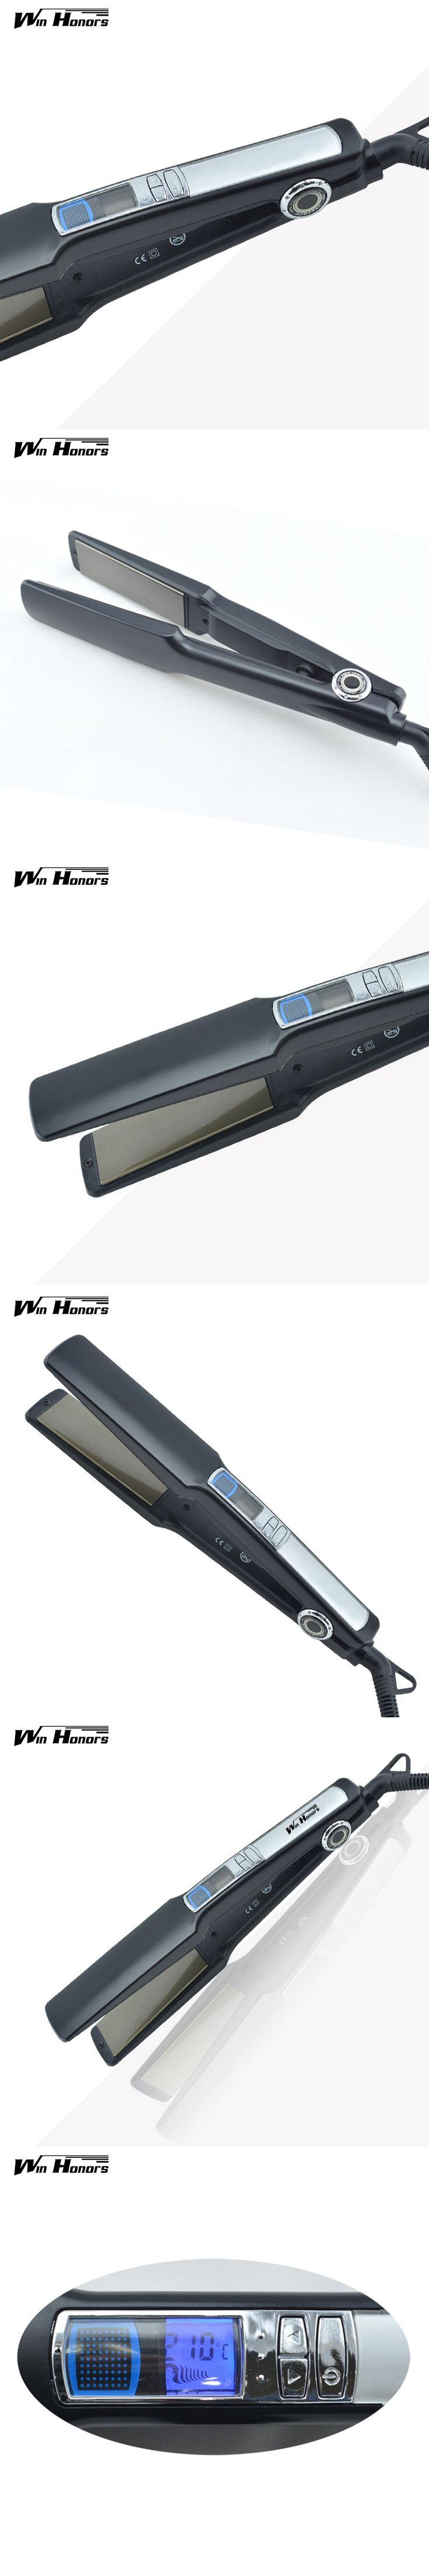 Be Professional Hair Straightening Irons Titanium Hair Straightener IronPlate Adjust Temperature Flat irons With Lcd Display